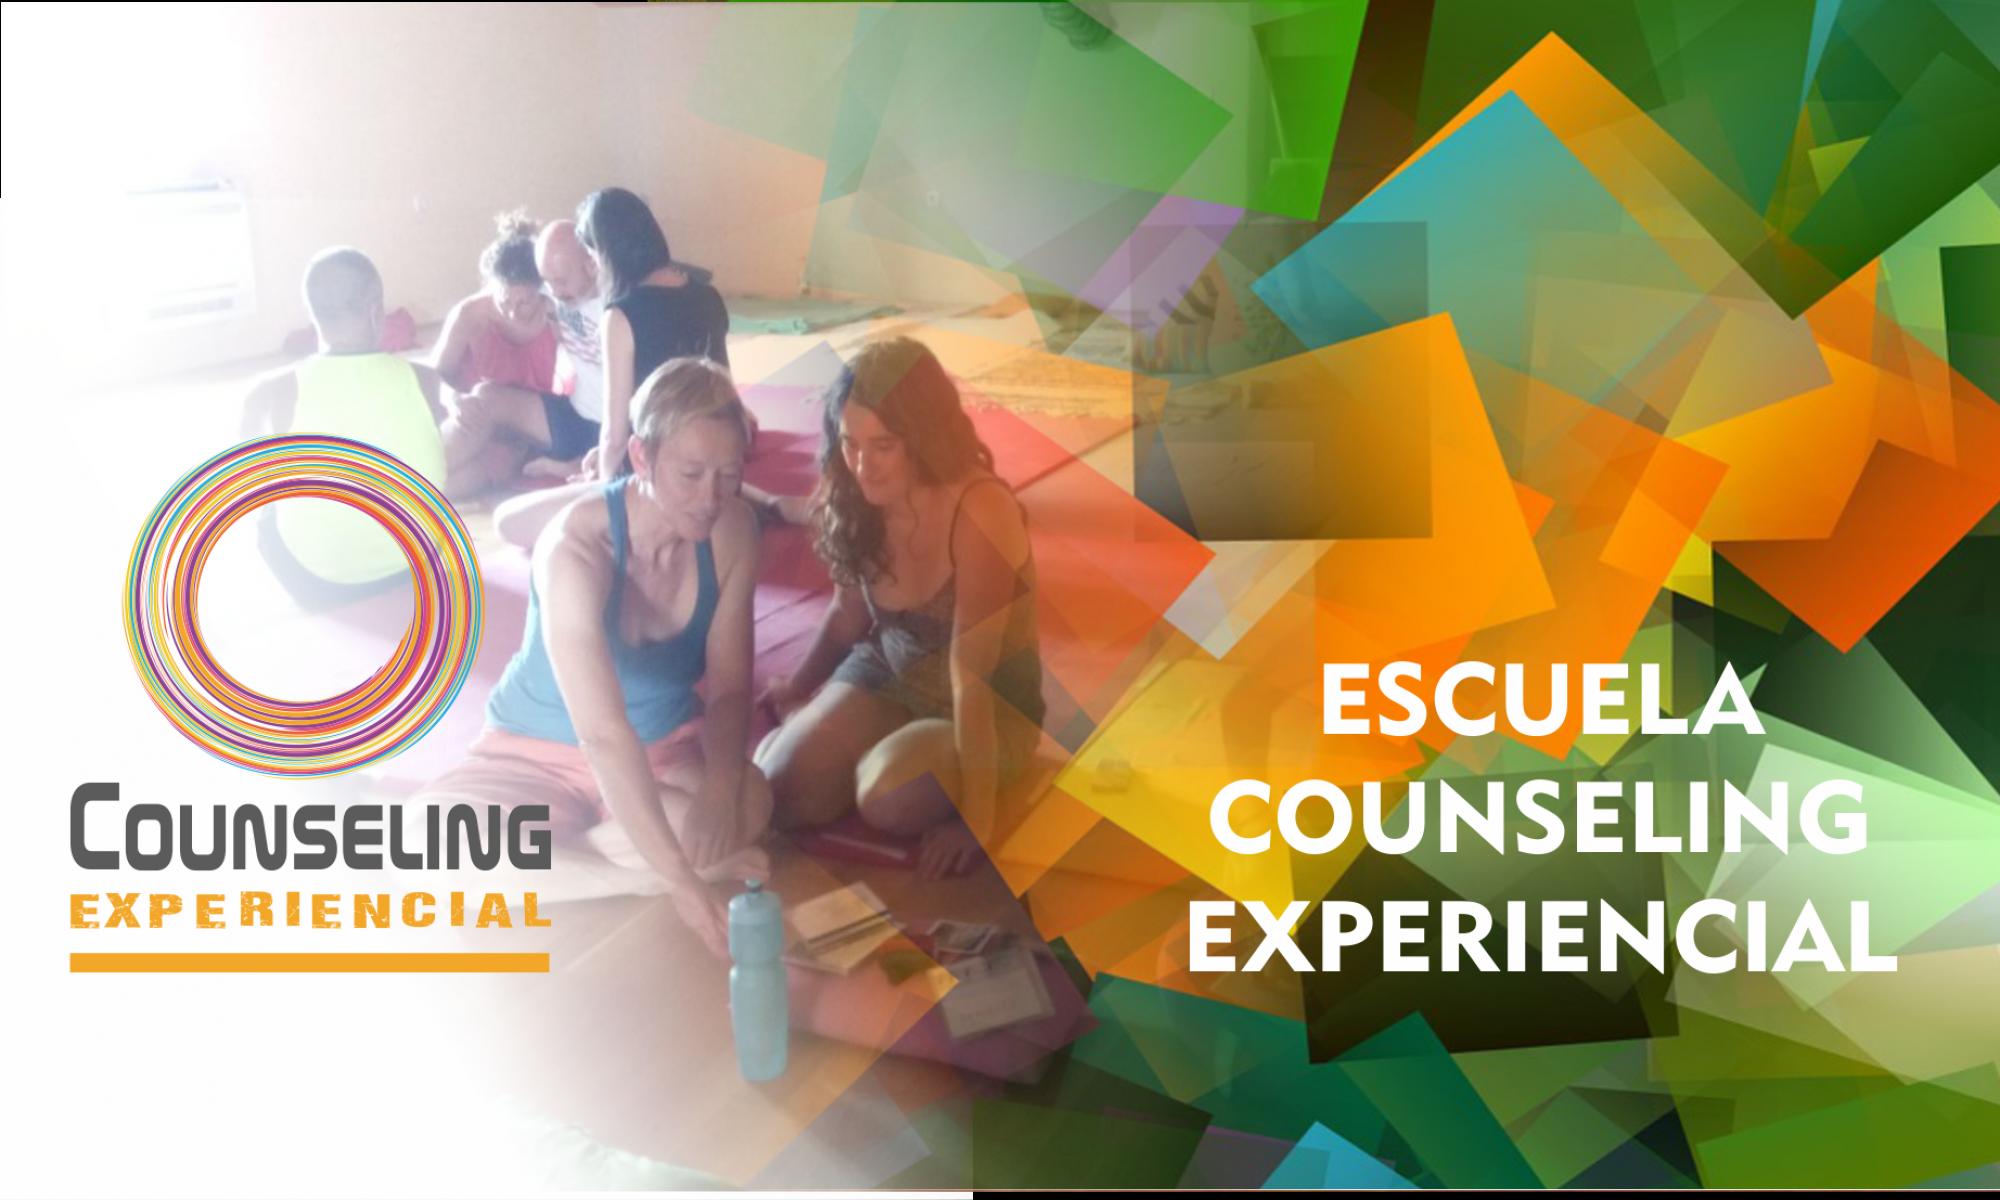 Escuela Counseling Experiencial